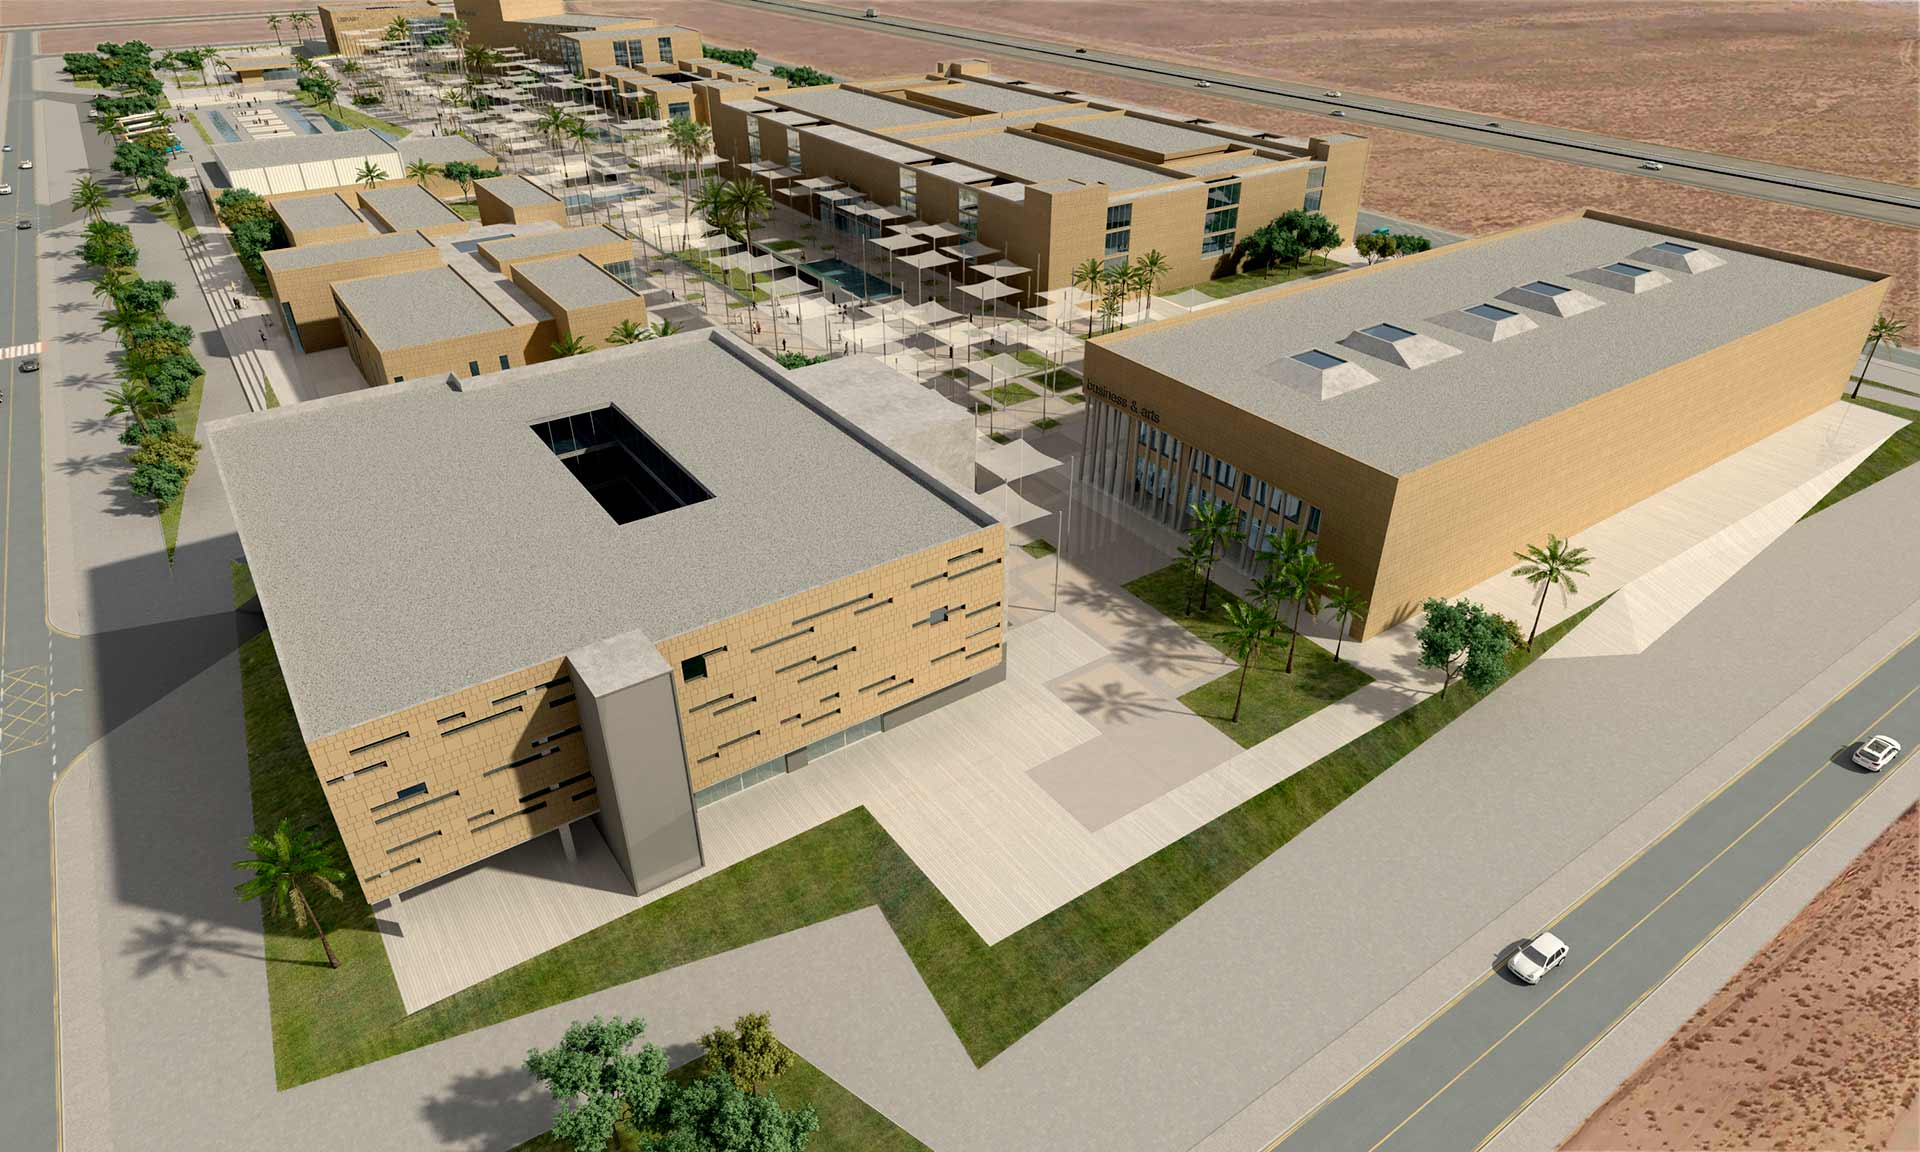 shaikh-khalifa-bin-zayed-institute (8)